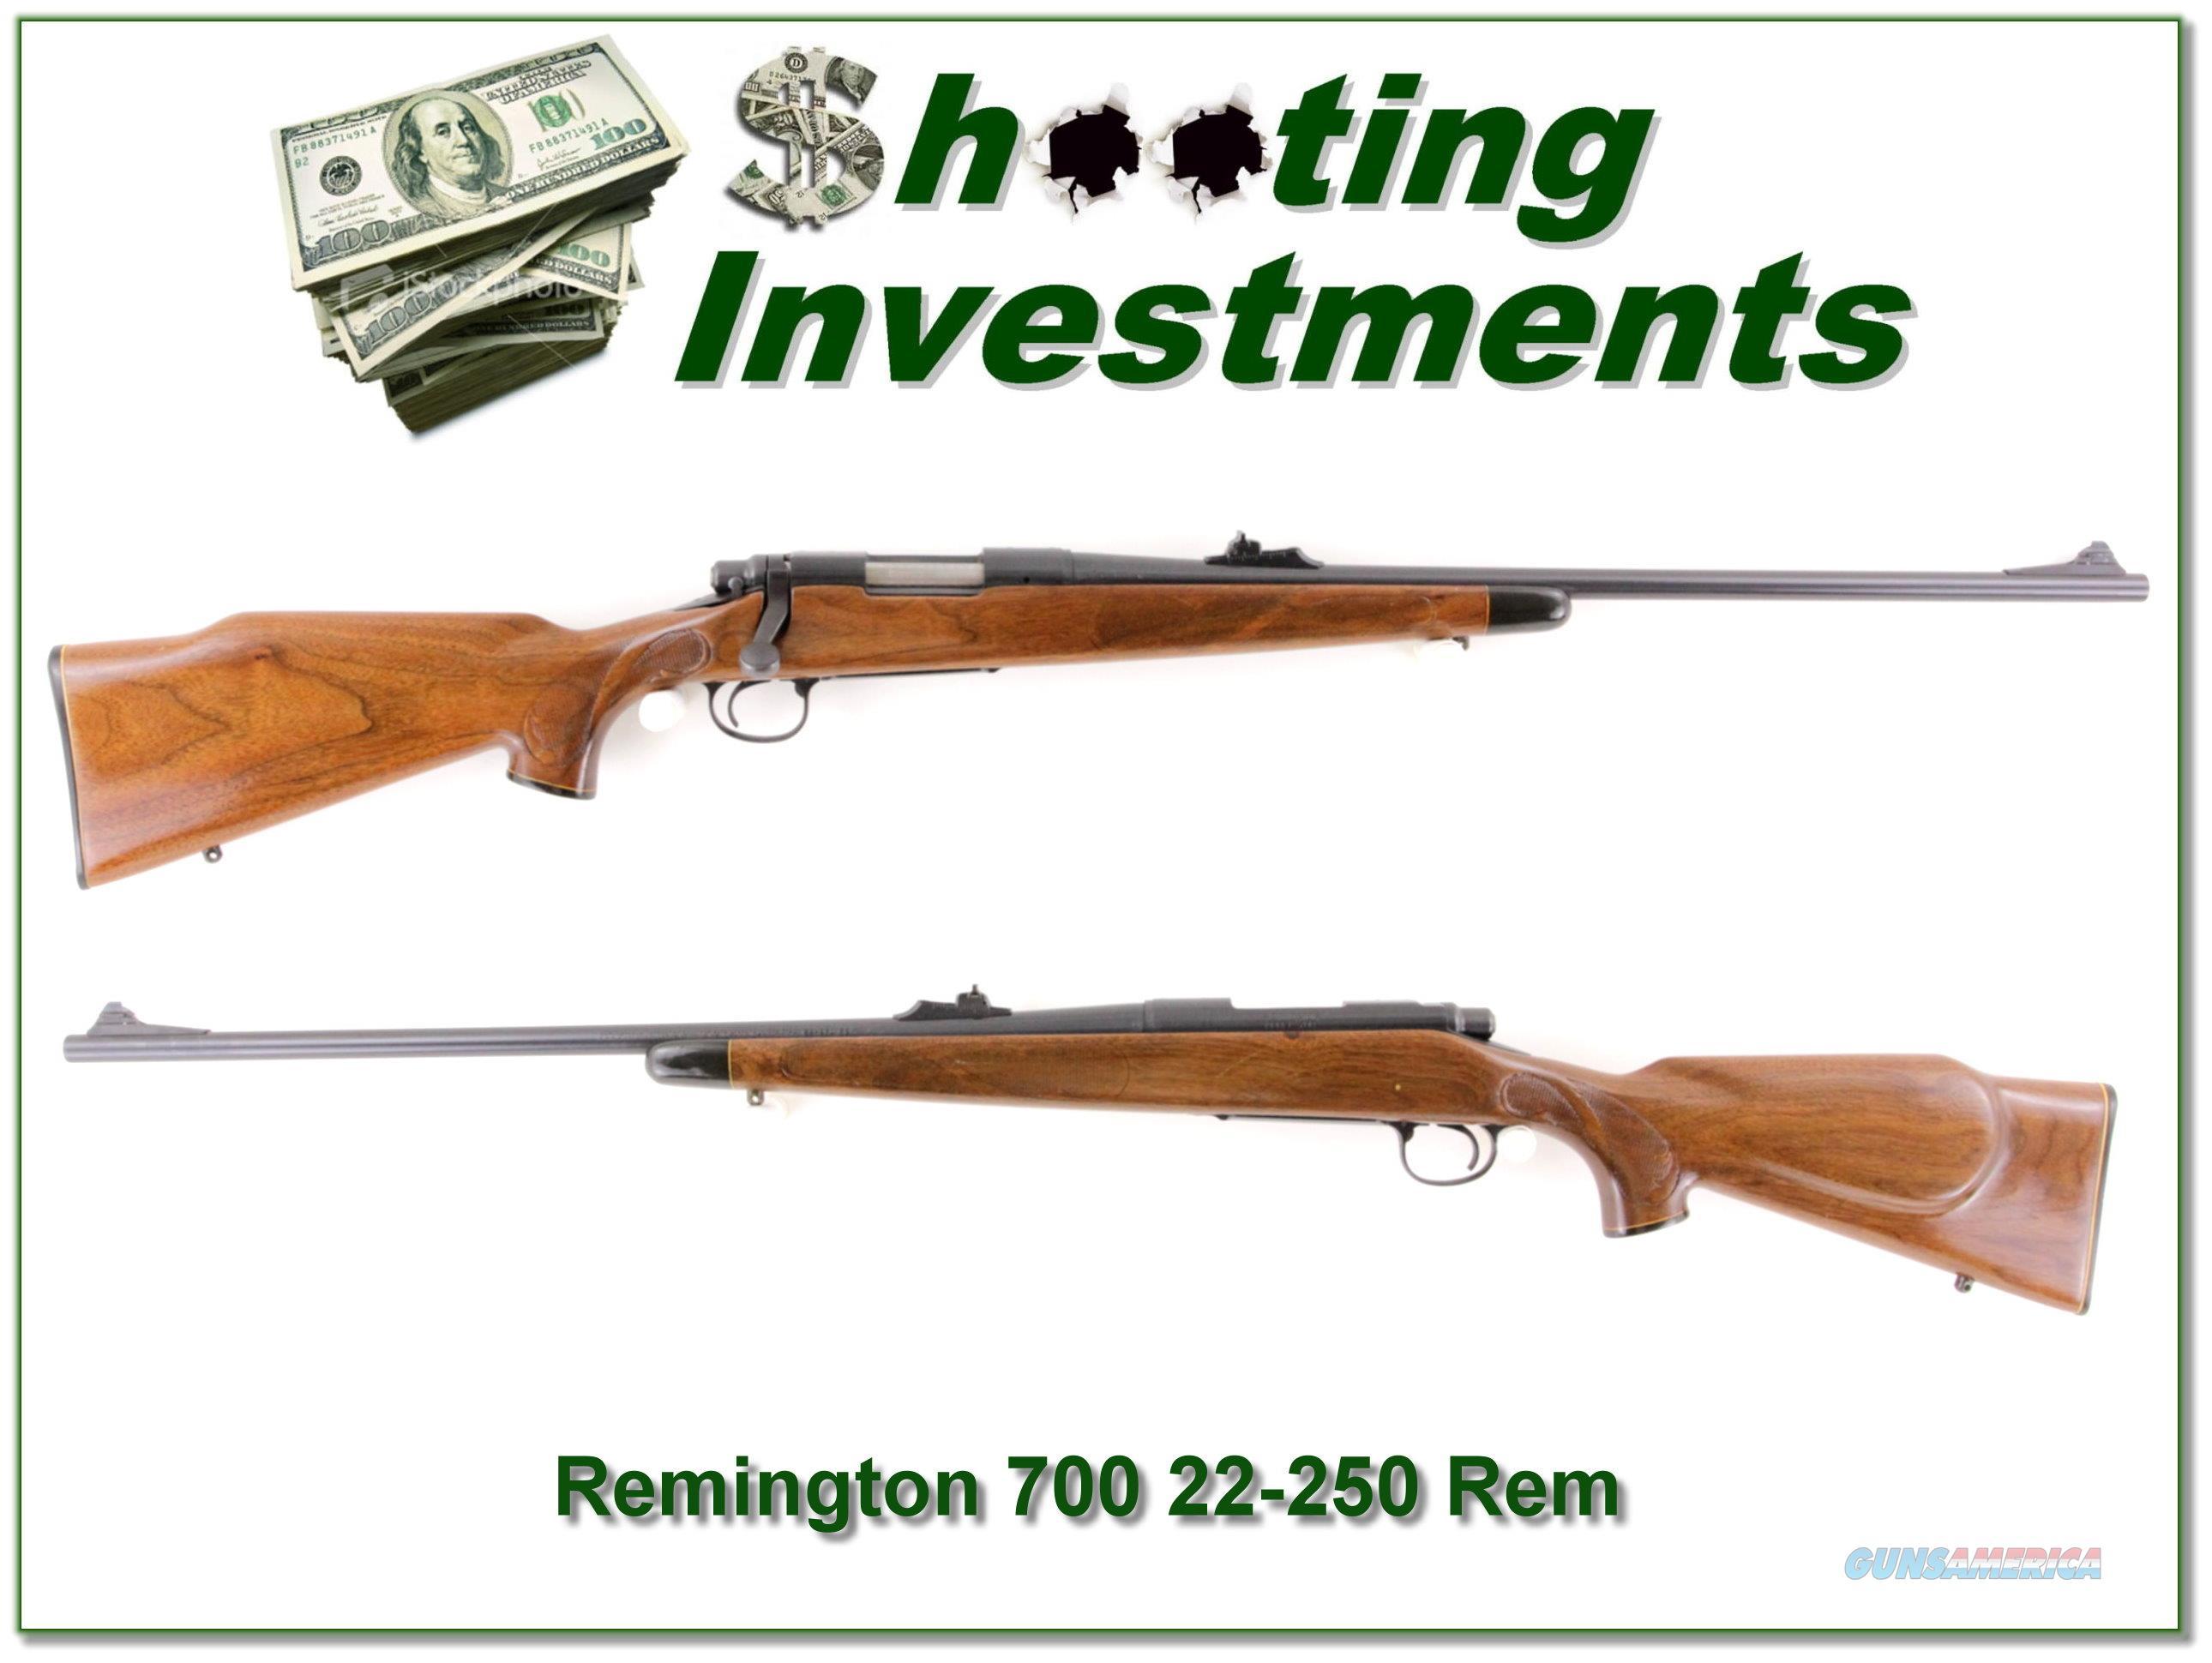 Remington 700 in 22-250 Remington  Guns > Rifles > Remington Rifles - Modern > Model 700 > Sporting